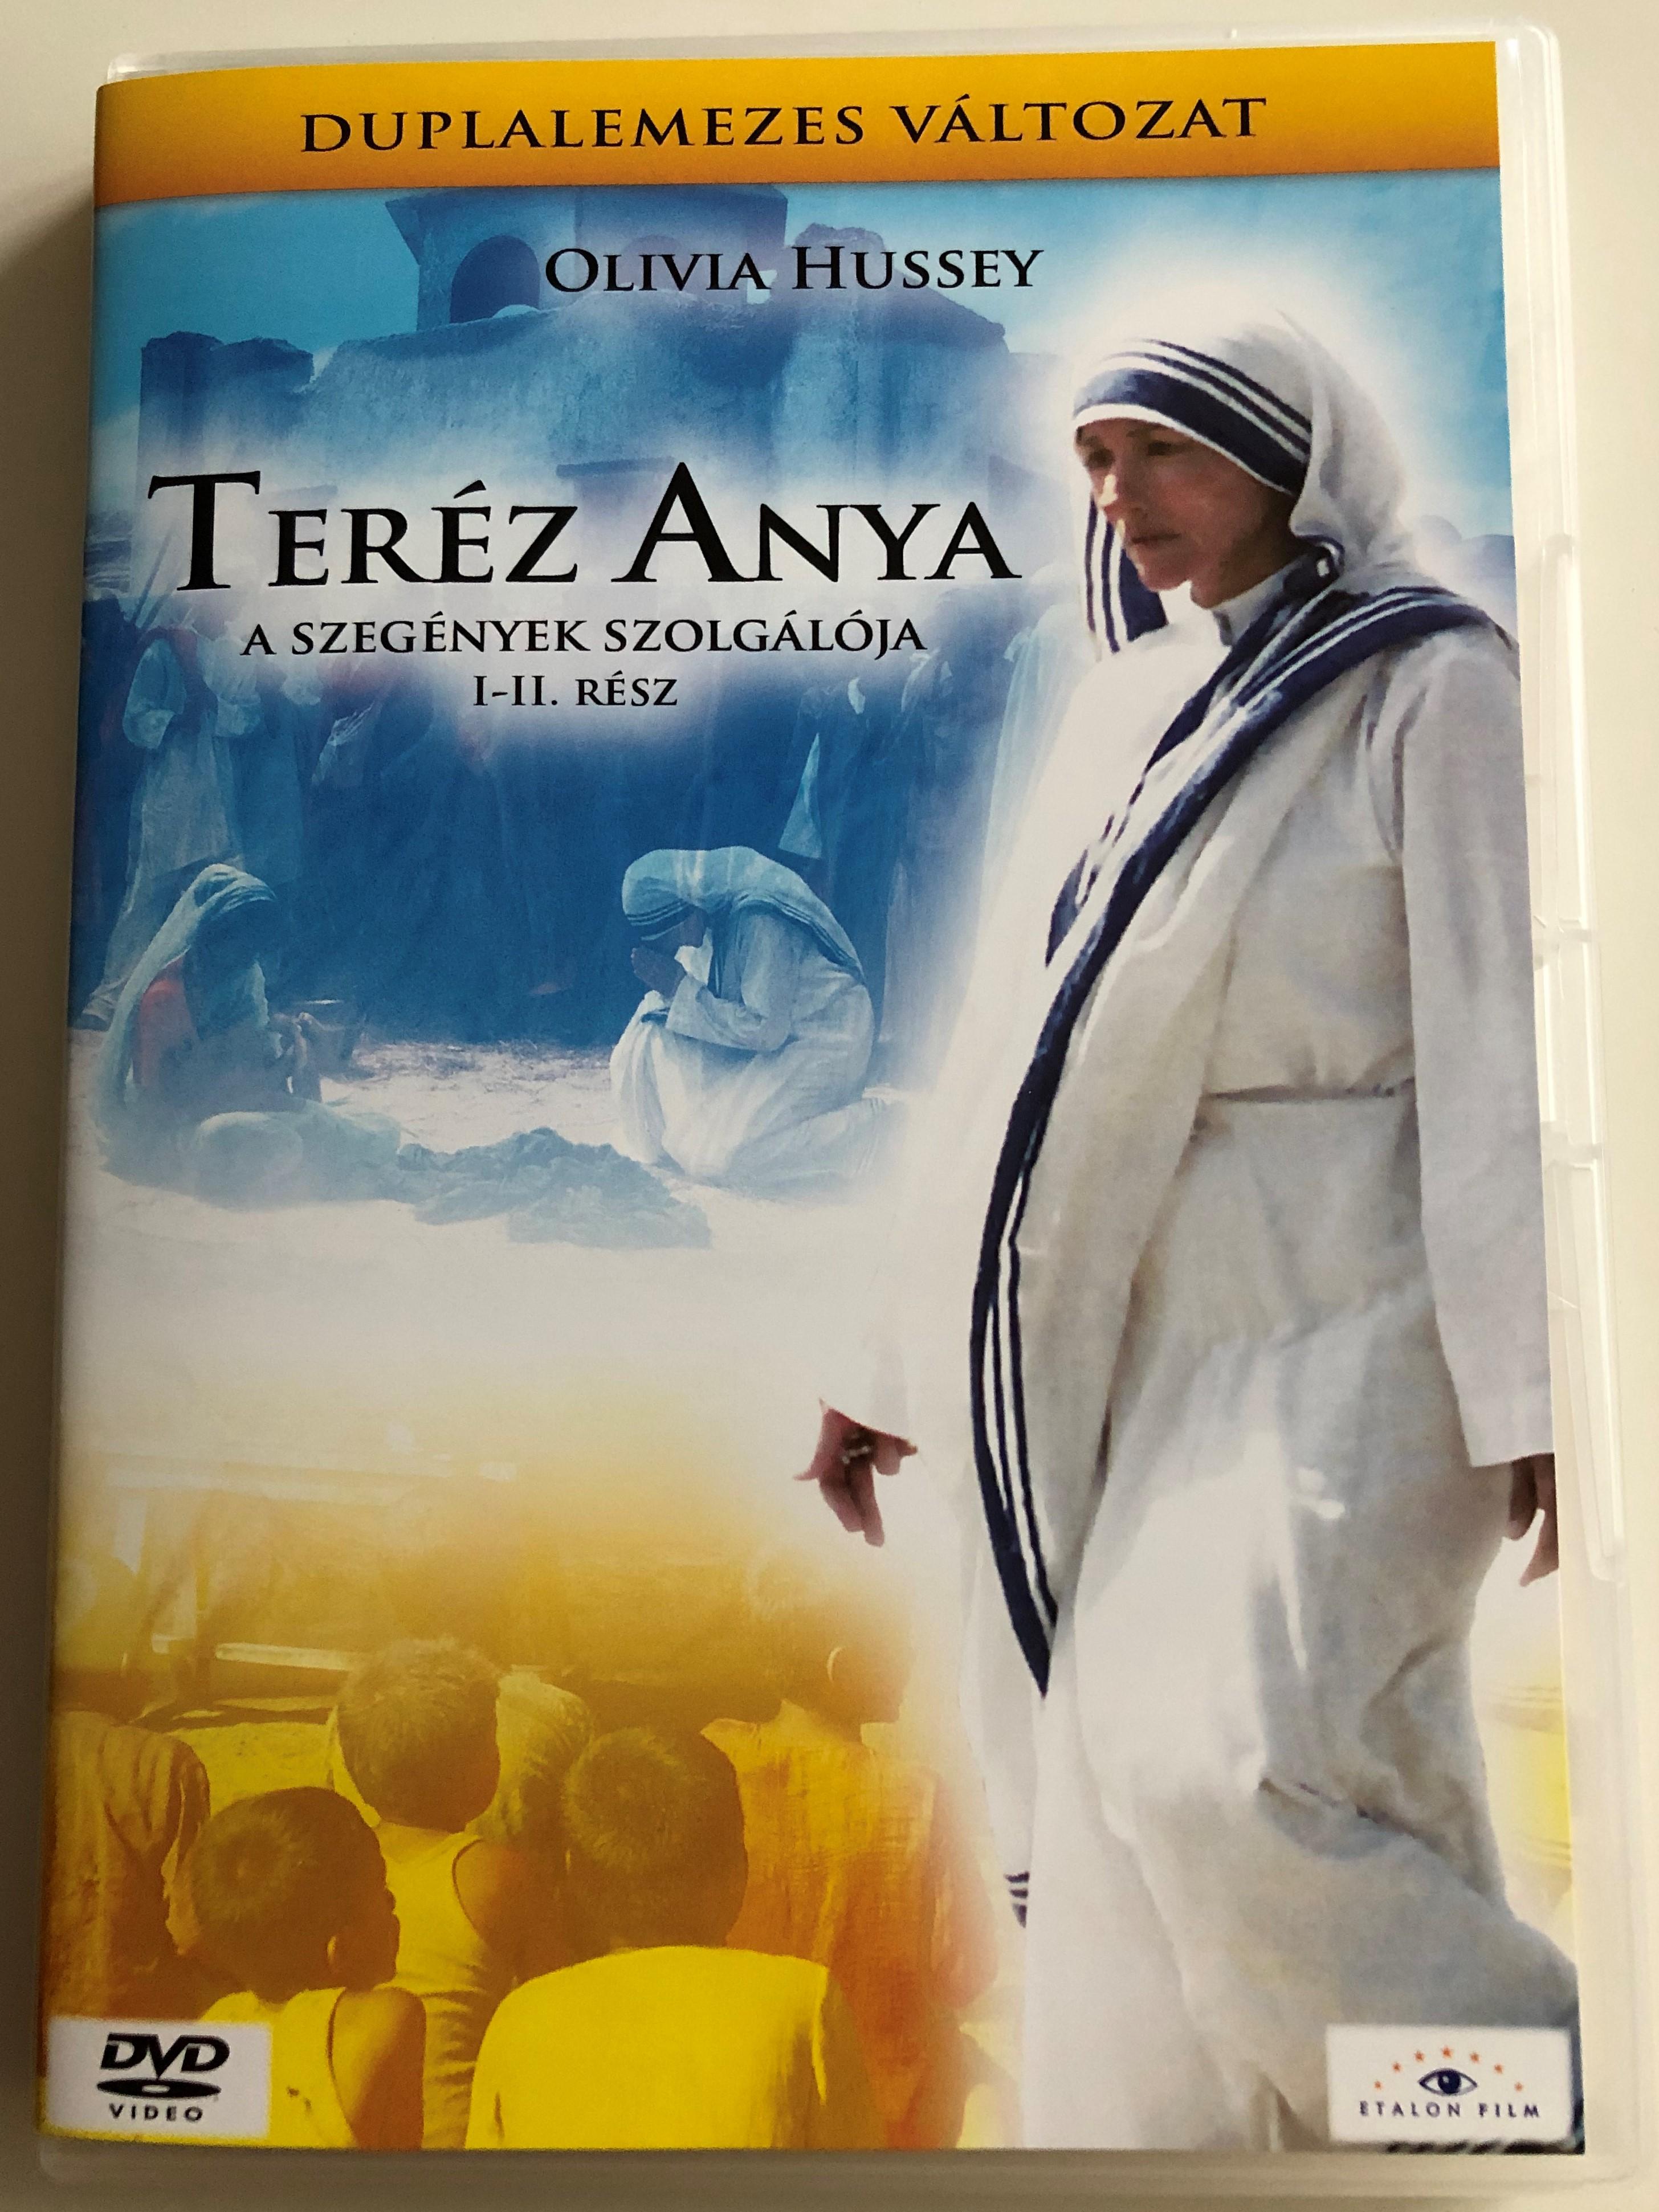 madre-teresa-part-i-ii-dvd-2003-ter-z-anya-a-szeg-nyek-szolg-l-ja-i-ii-directed-by-fabrizio-costa-starring-olivia-hussey-sebastiano-somma-michael-mendl-1-.jpg